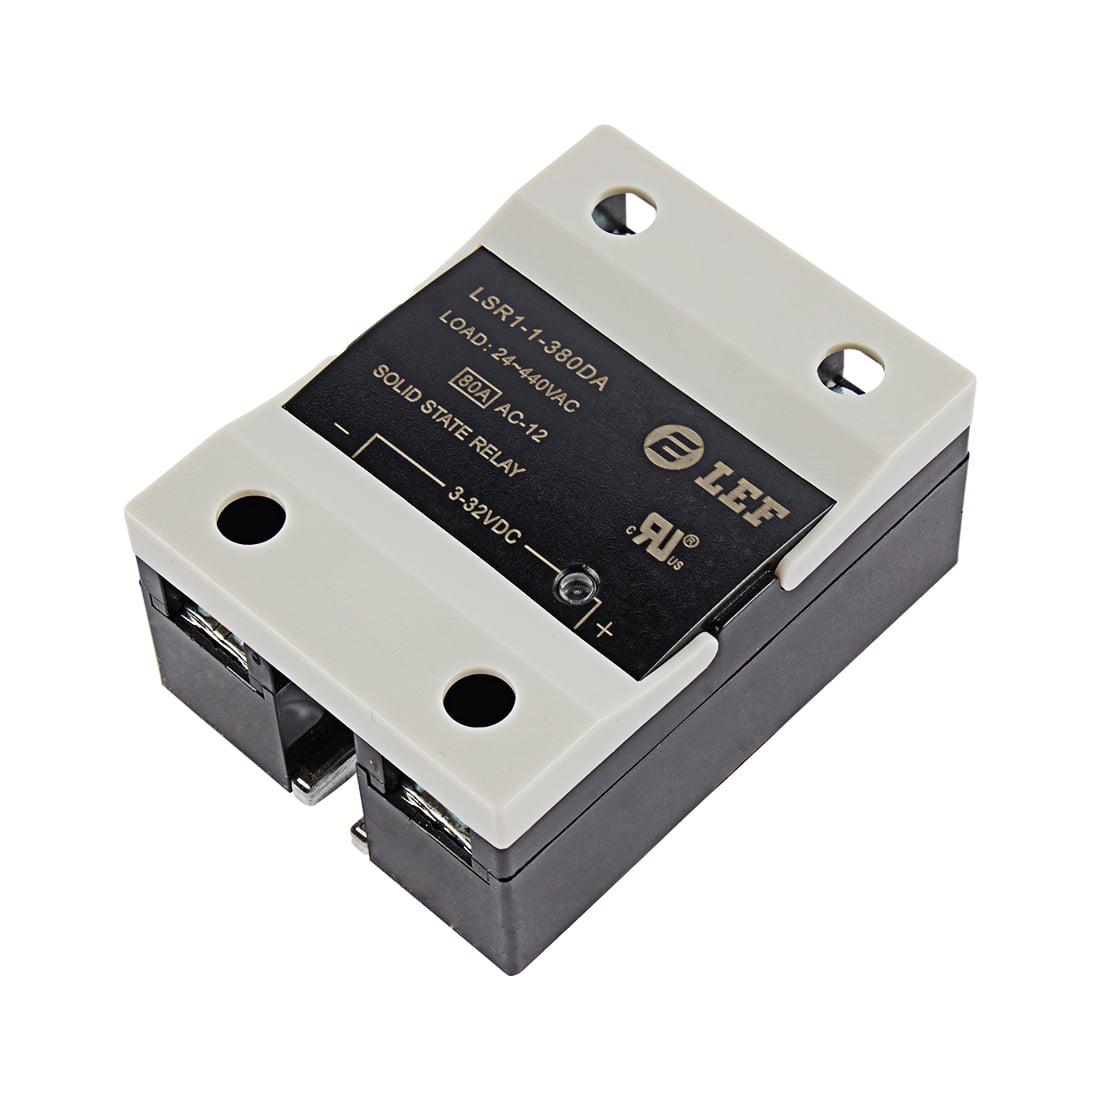 24v 380v 75a 250v Ssr 75 Da Solid State Relay Module 3 32v Dc To Ac Wiring Diagram